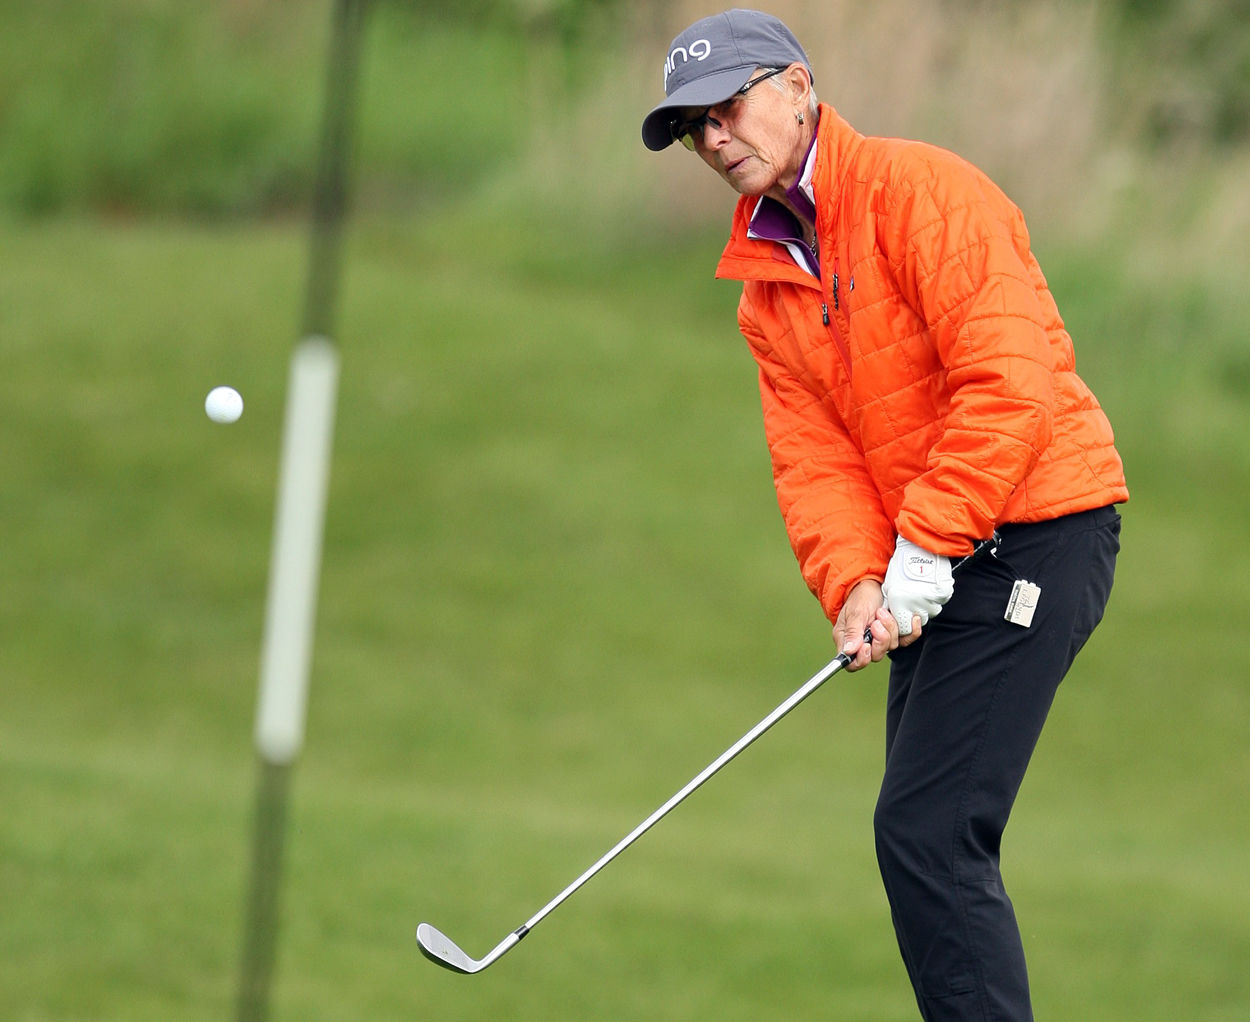 Wisconsin womens amateur golf open